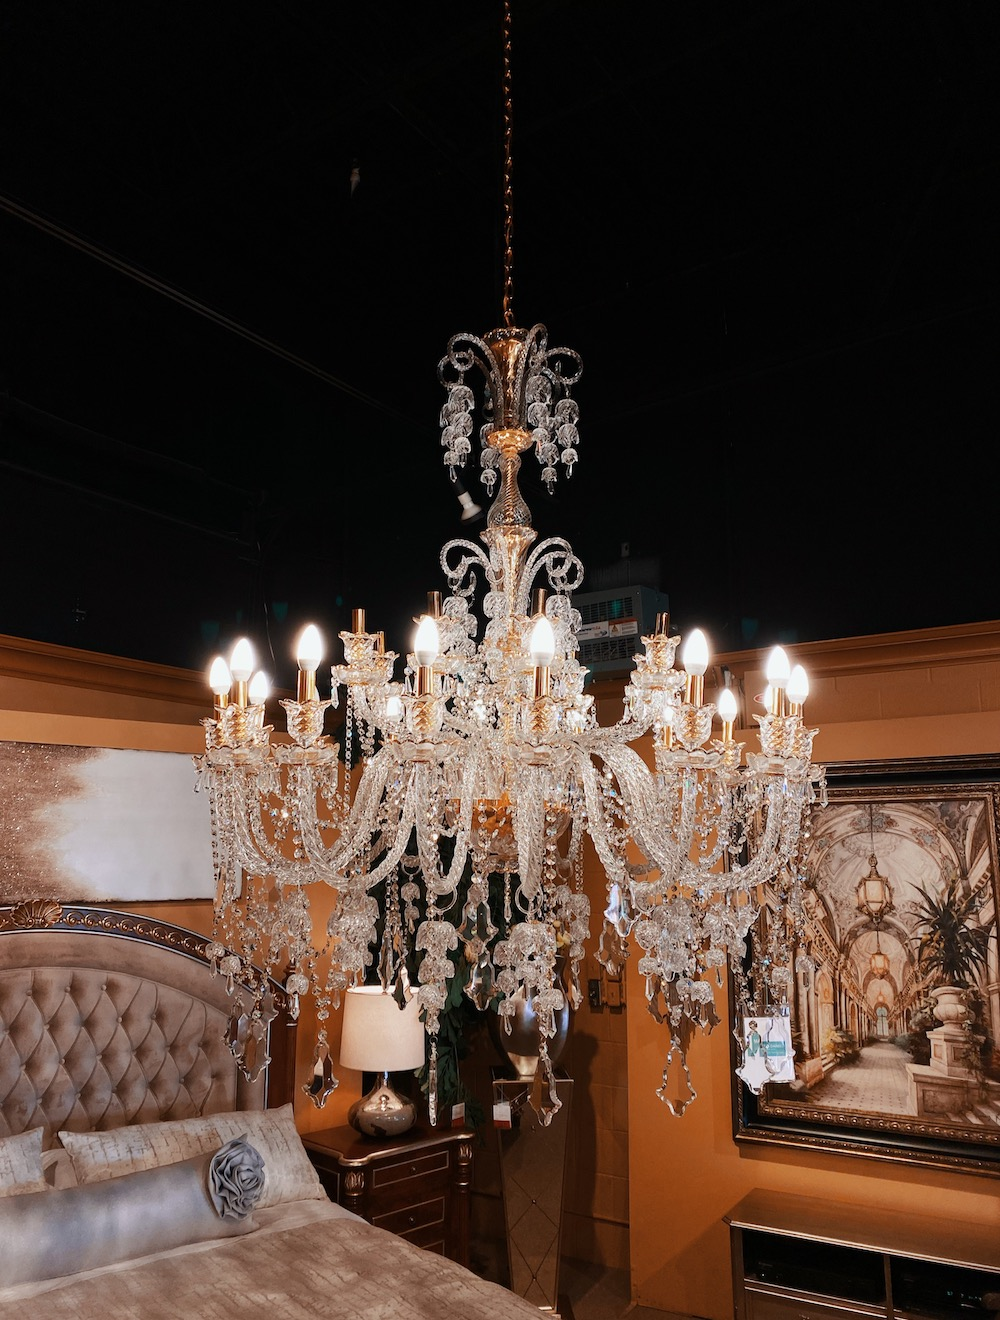 martin daniel interiors Toronto luxury lighting home decor 2